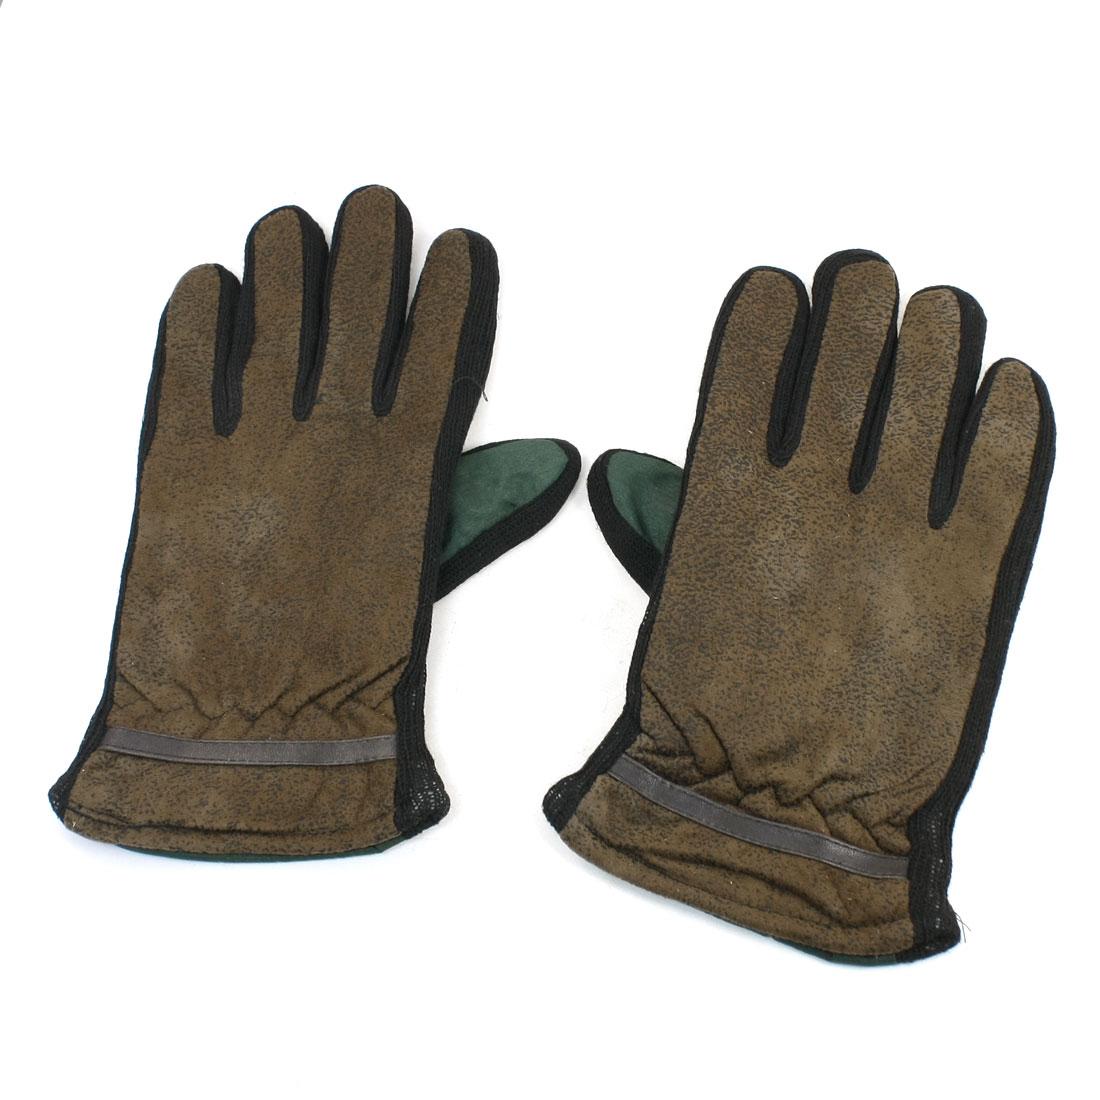 Pair Brown Green Full Finger Winter Thermal Gloves M Size for Unisex